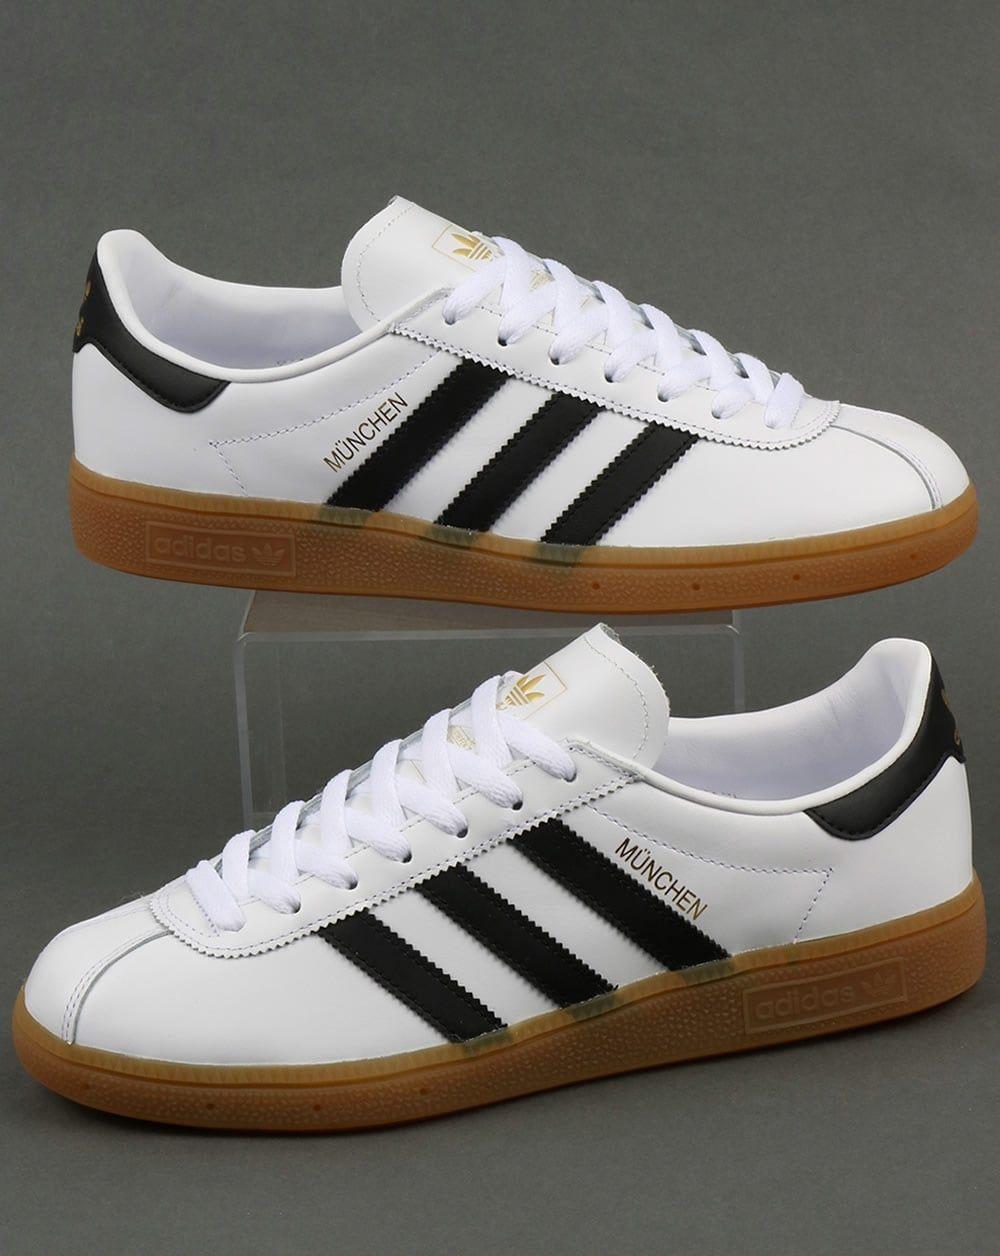 perdonar costilla garrapata  Adidas Munchen Trainers White/Black,leather,originals ... adidas munchen  trainers shoes gazelle mercury fre… | Sneakers men fashion, Adidas outfit  shoes, Sneakers